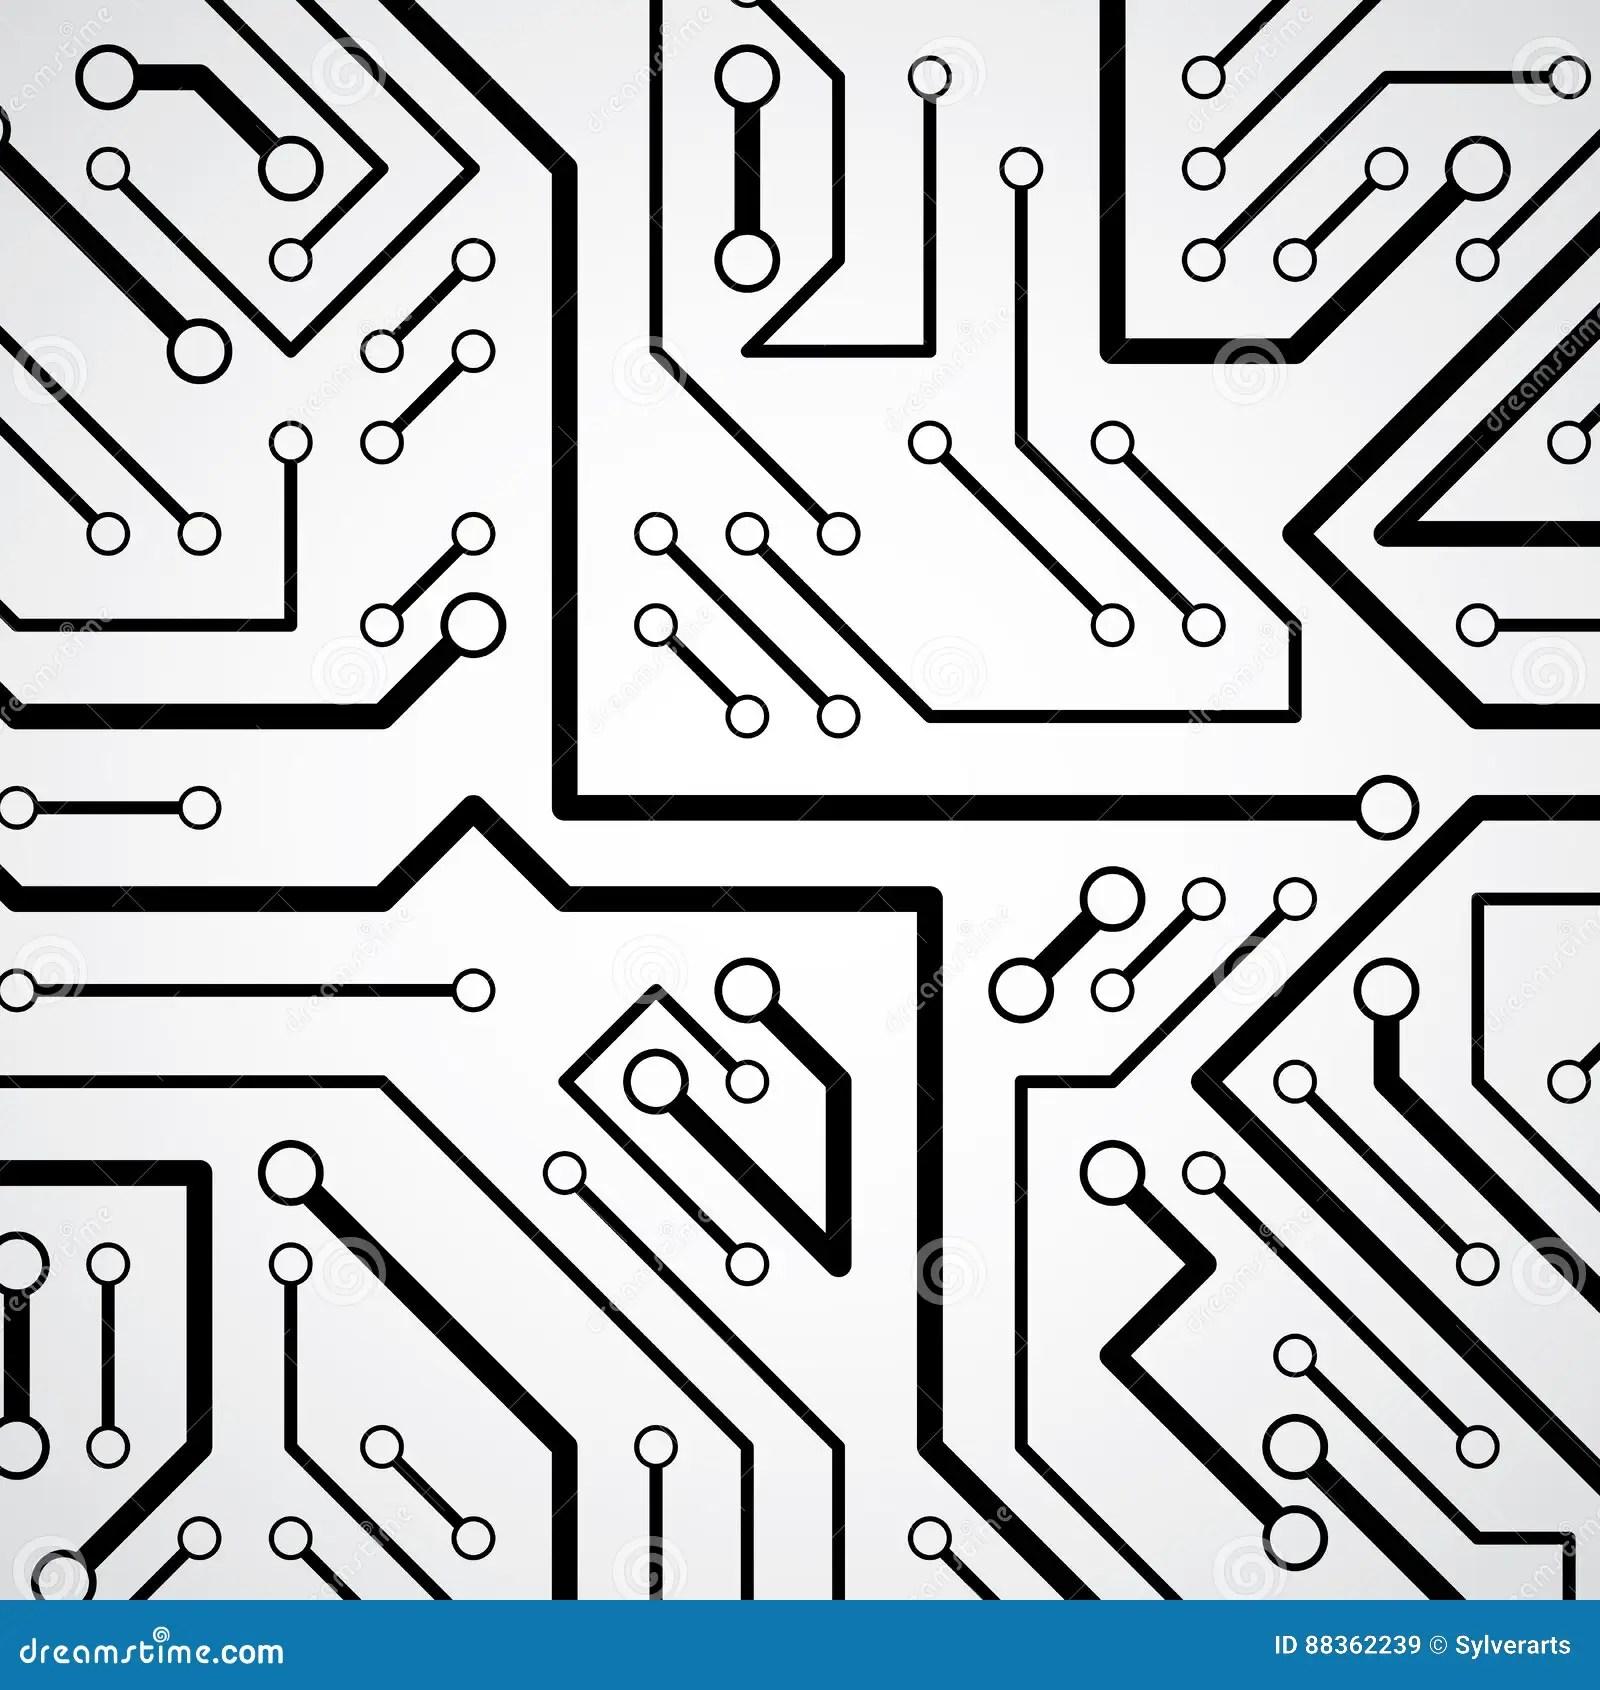 Circuit Board Futuristic Cybernetic Texture Information